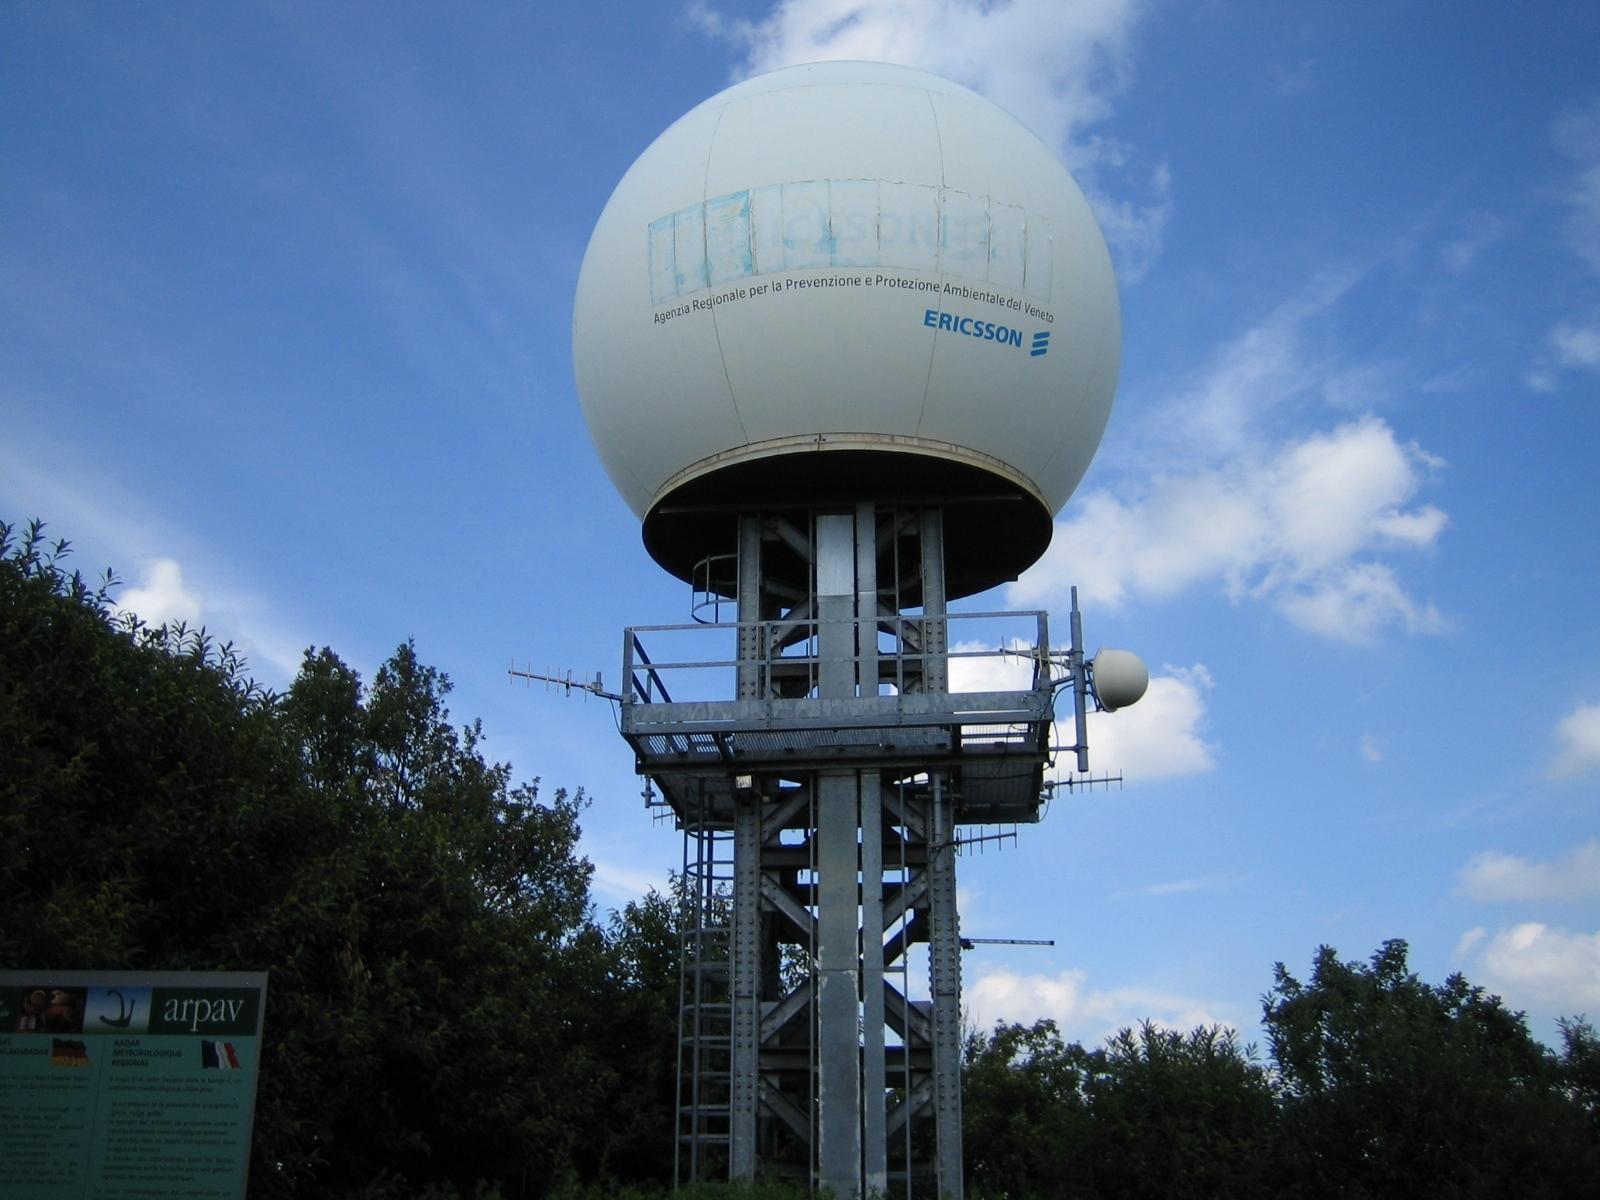 Pulse-Doppler radar